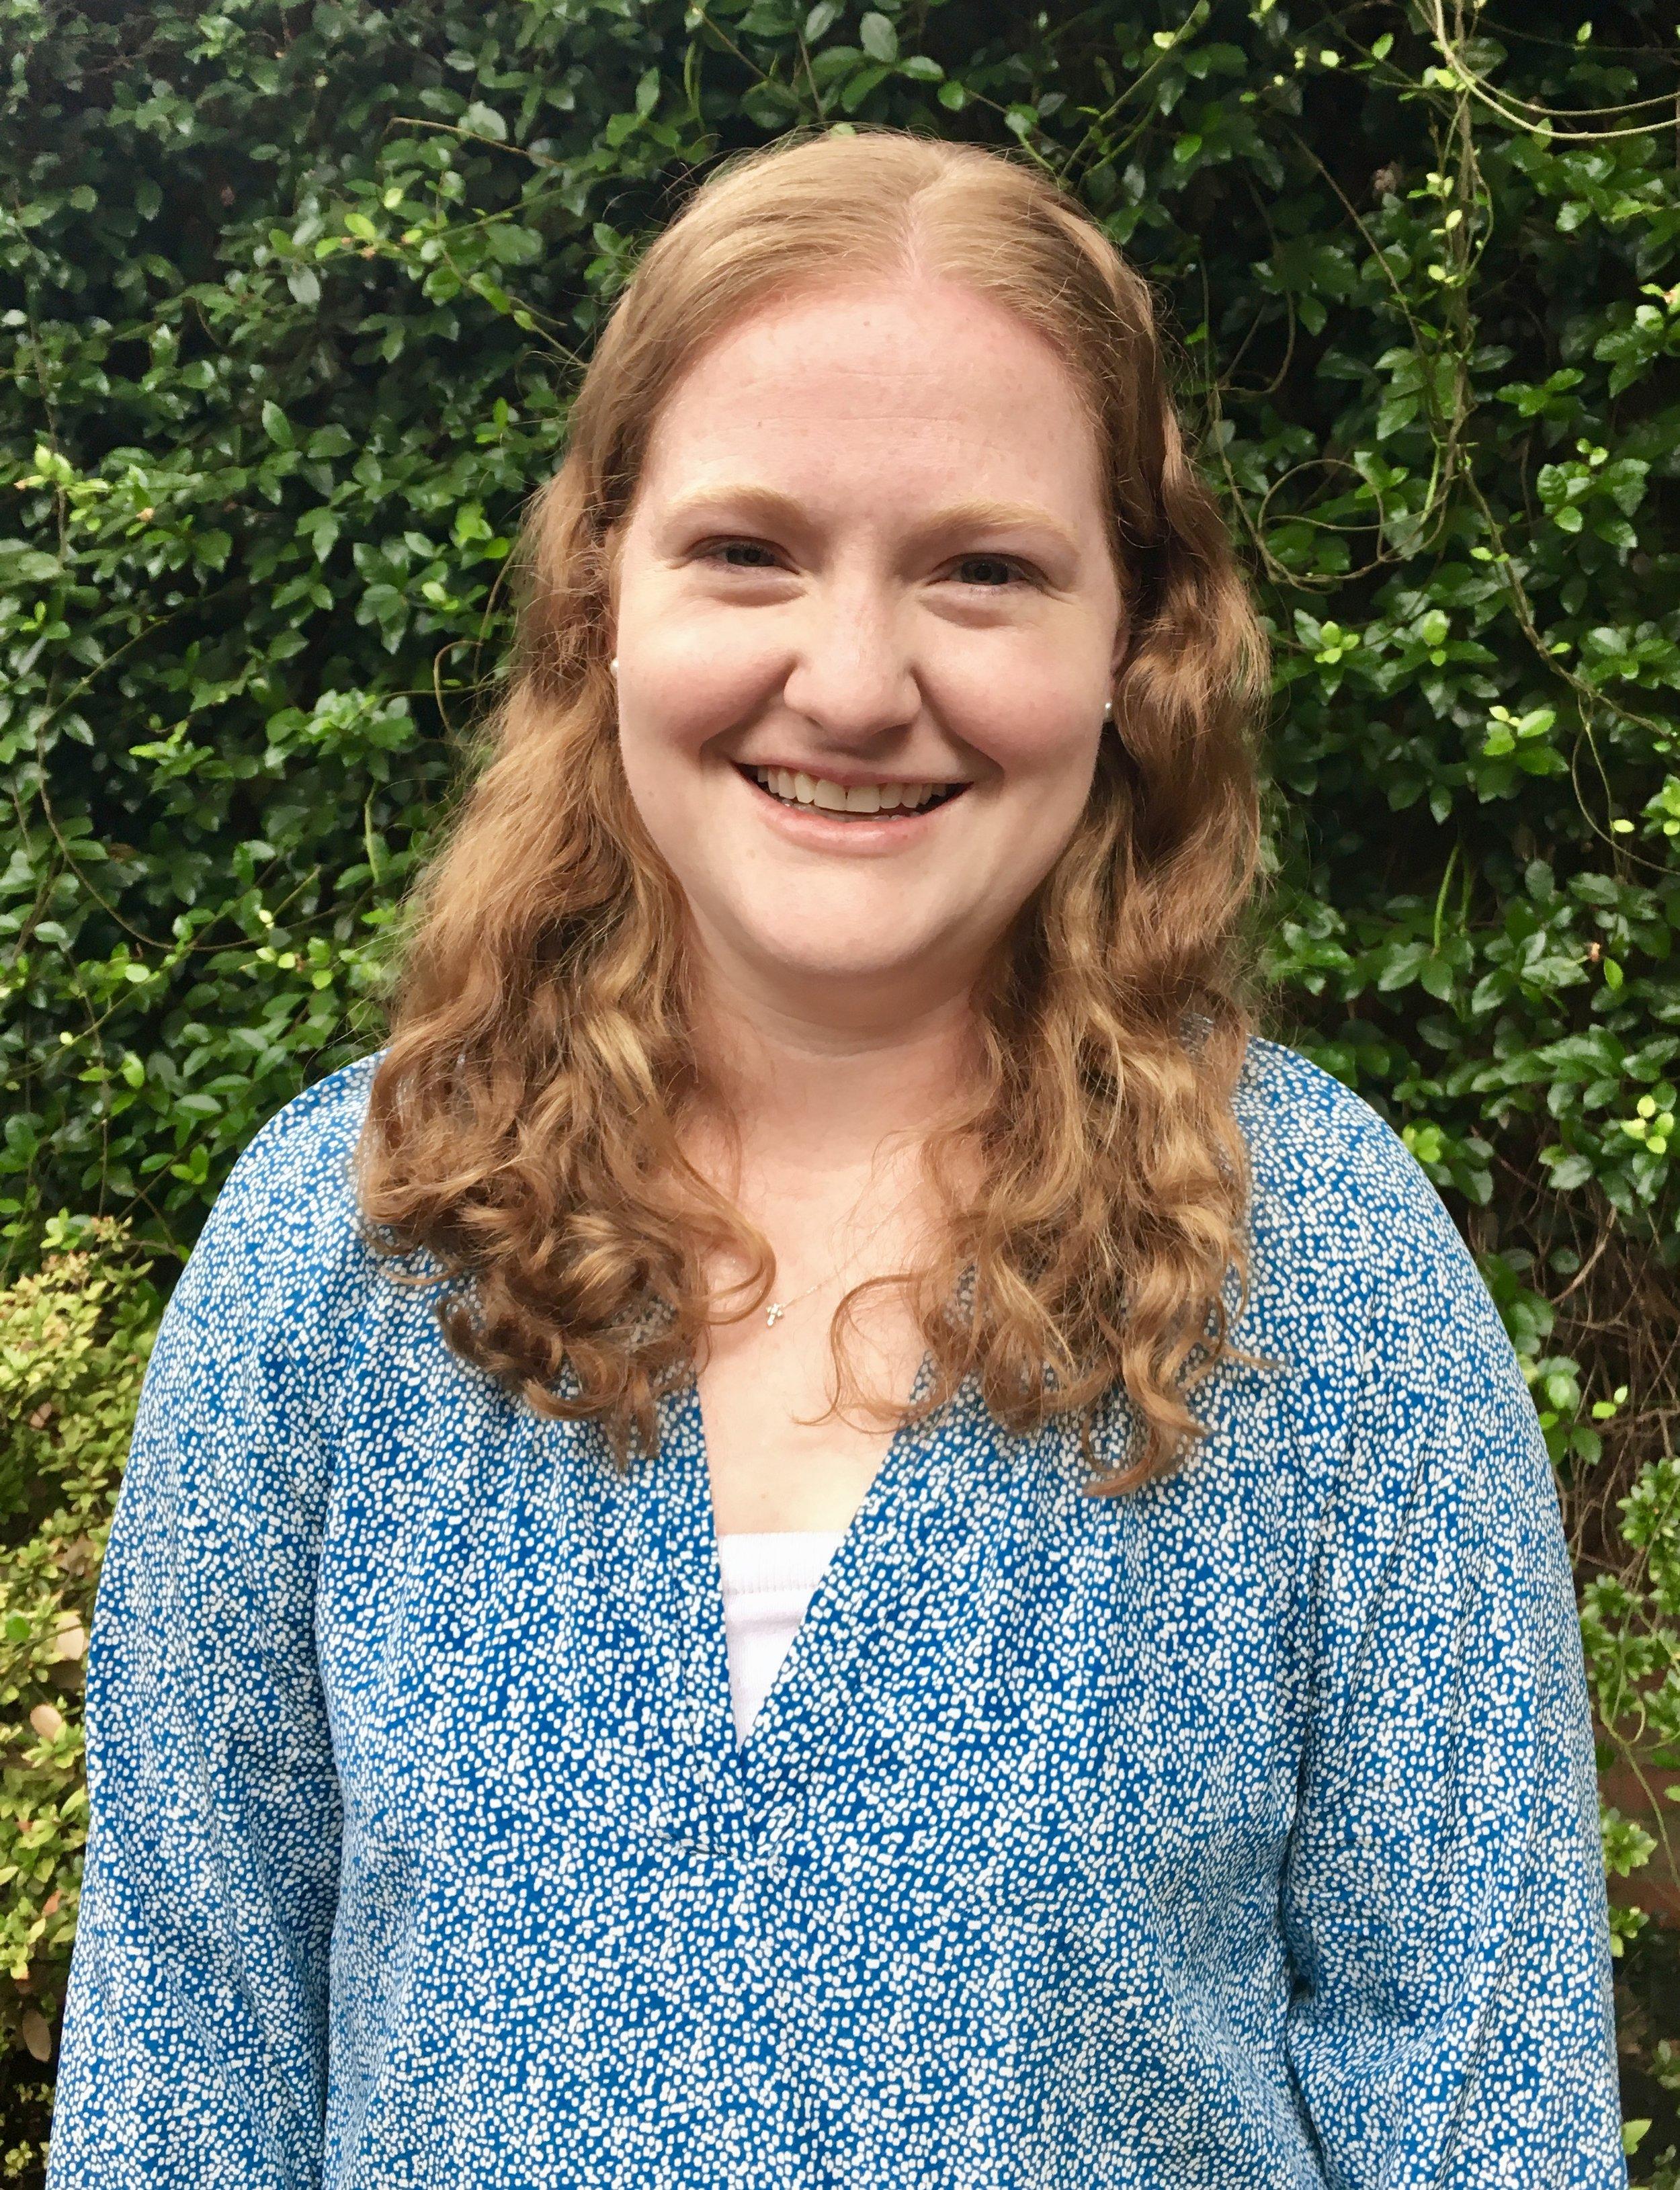 Sarah Gibson, Student Intern